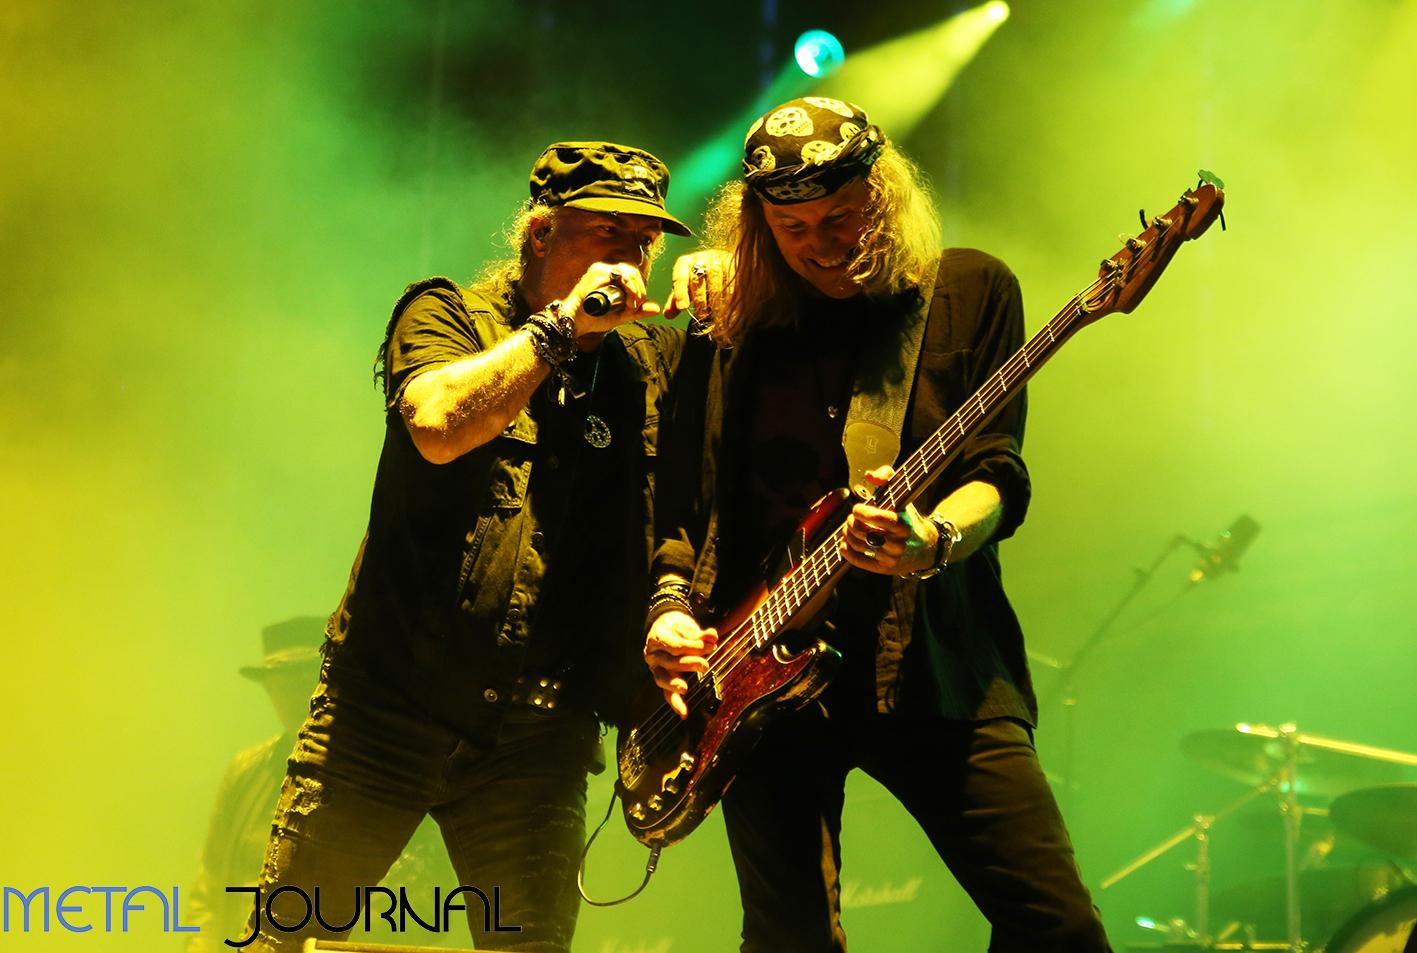 krokus - metal journal rock fest barcelona 2019 pic 5